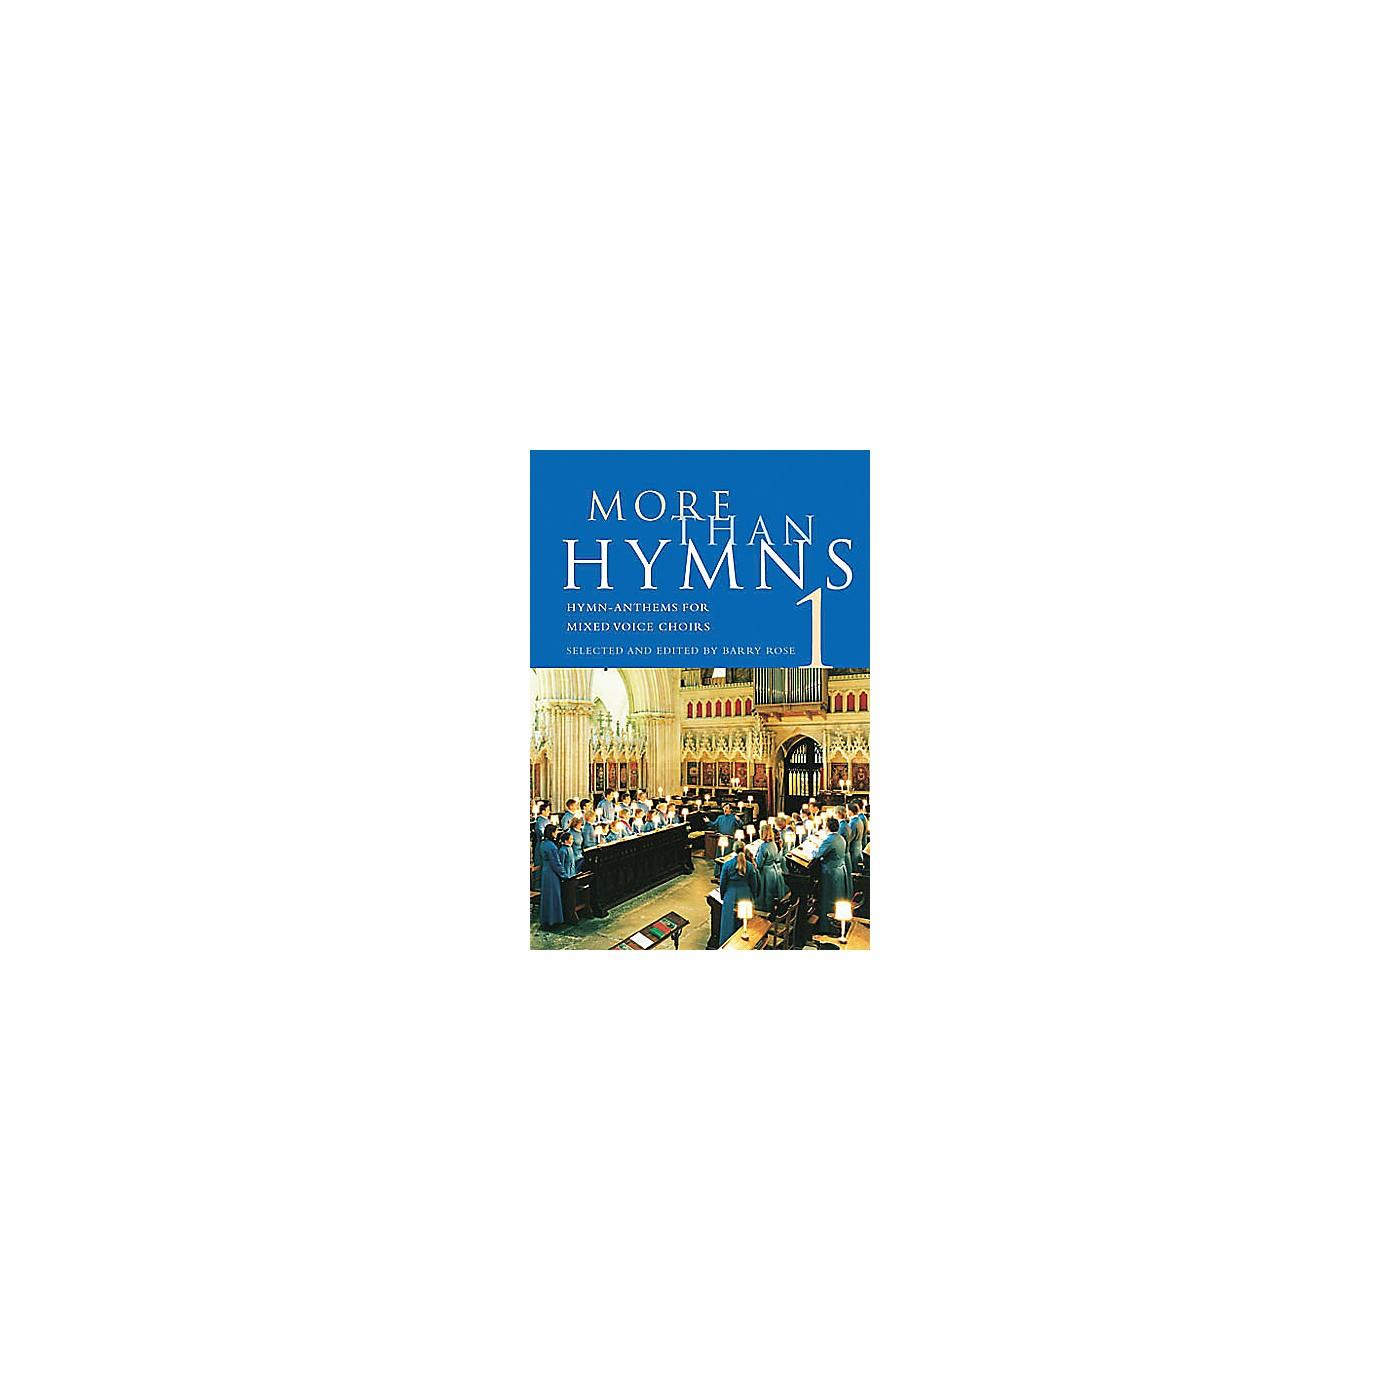 Novello More Than Hymns 1 (Hymn-Anthems for Mixed Voice Choirs) SATB thumbnail